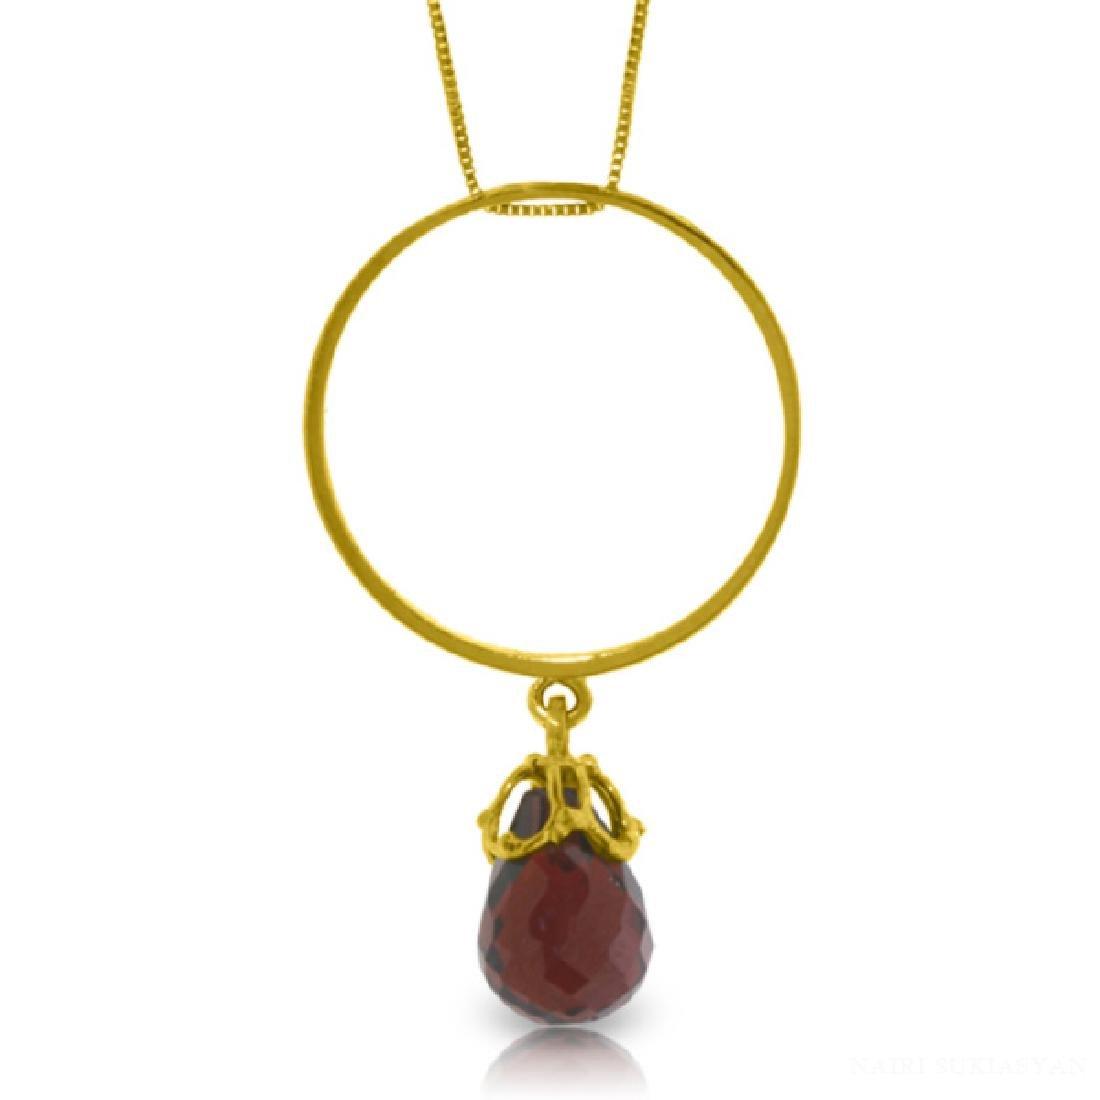 Genuine 3 ctw Garnet Necklace Jewelry 14KT Yellow Gold